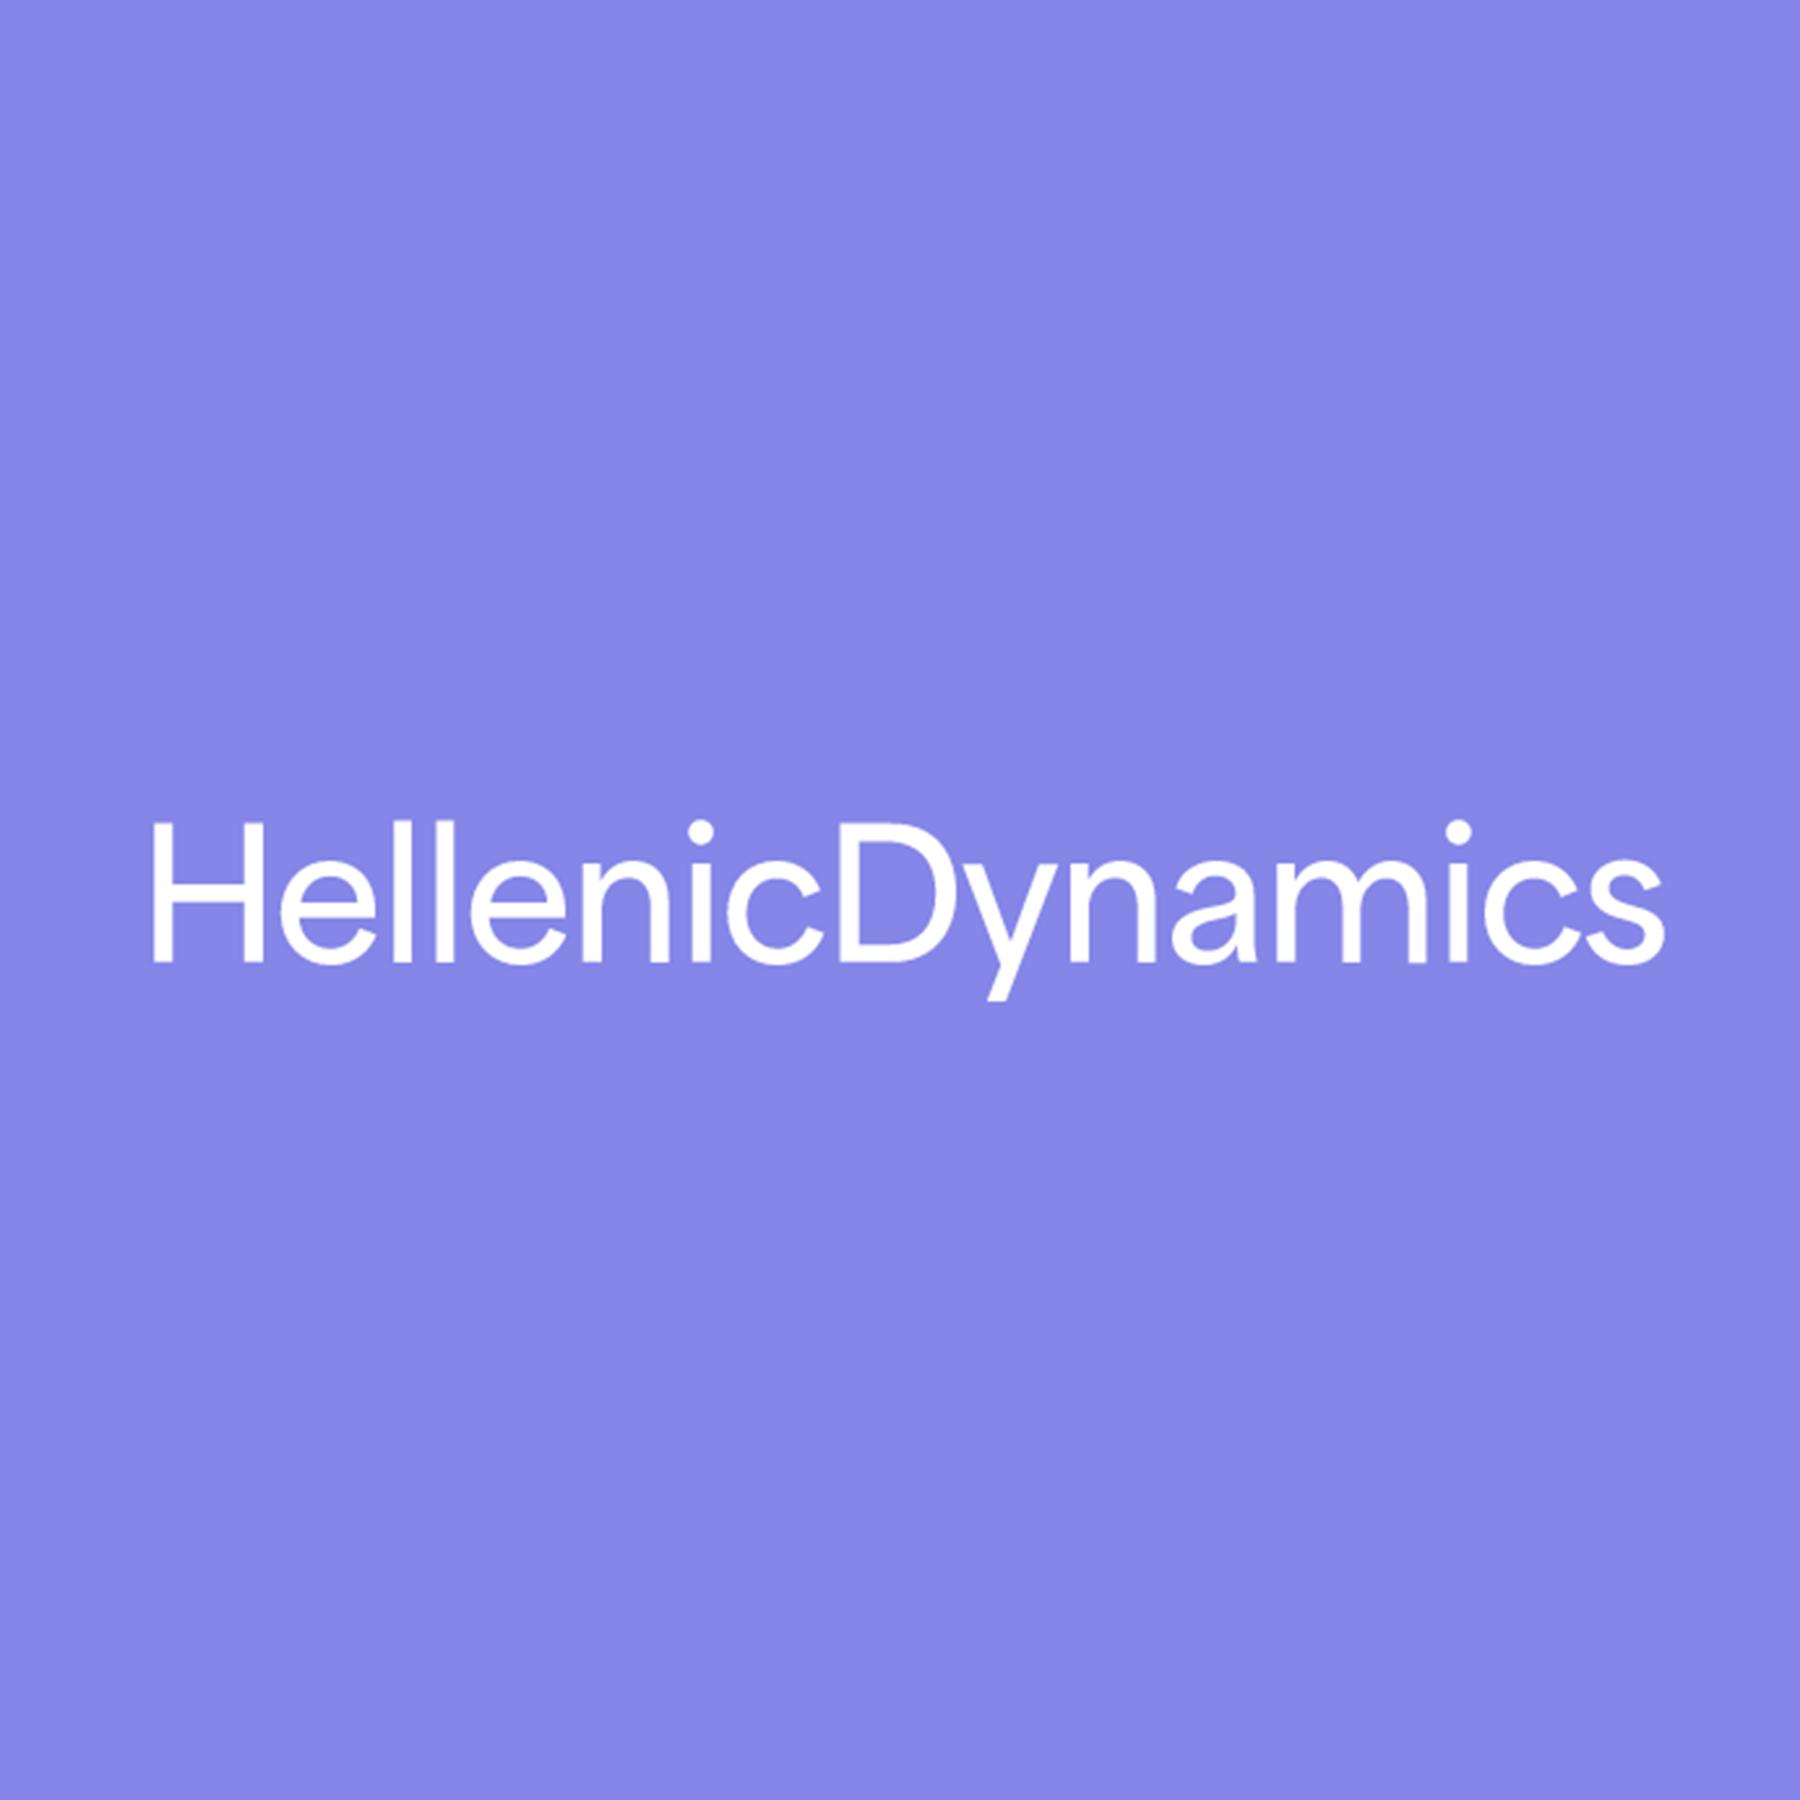 HellenicDynamics